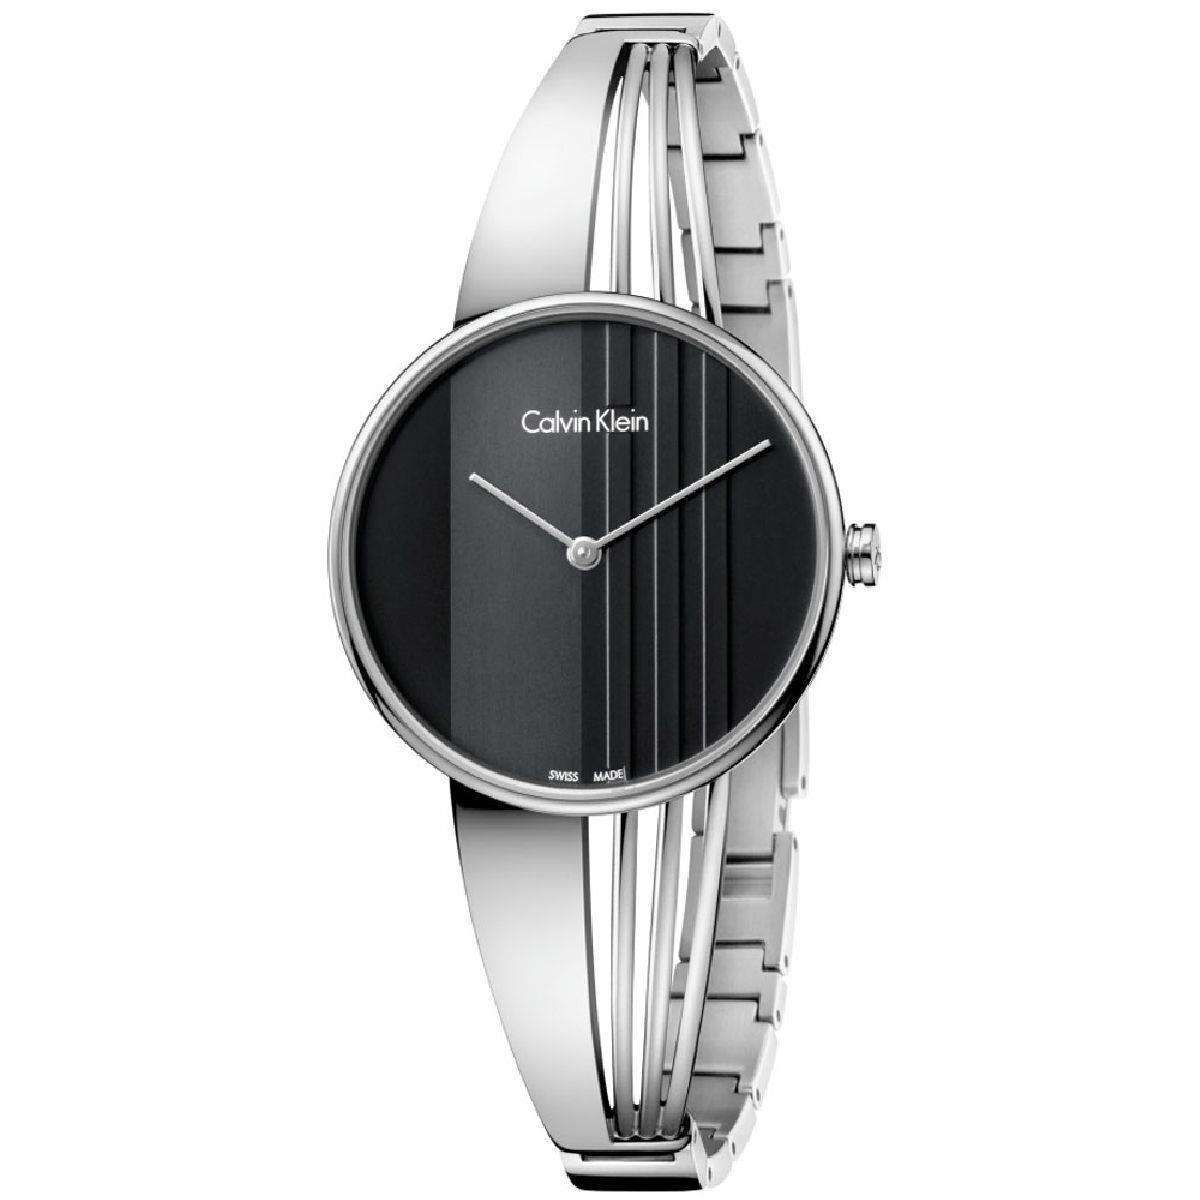 18d73a9af36 Relógio Feminino Calvin Klein - K6S2N111 - K6S2N111 - CALVIN KLEIN